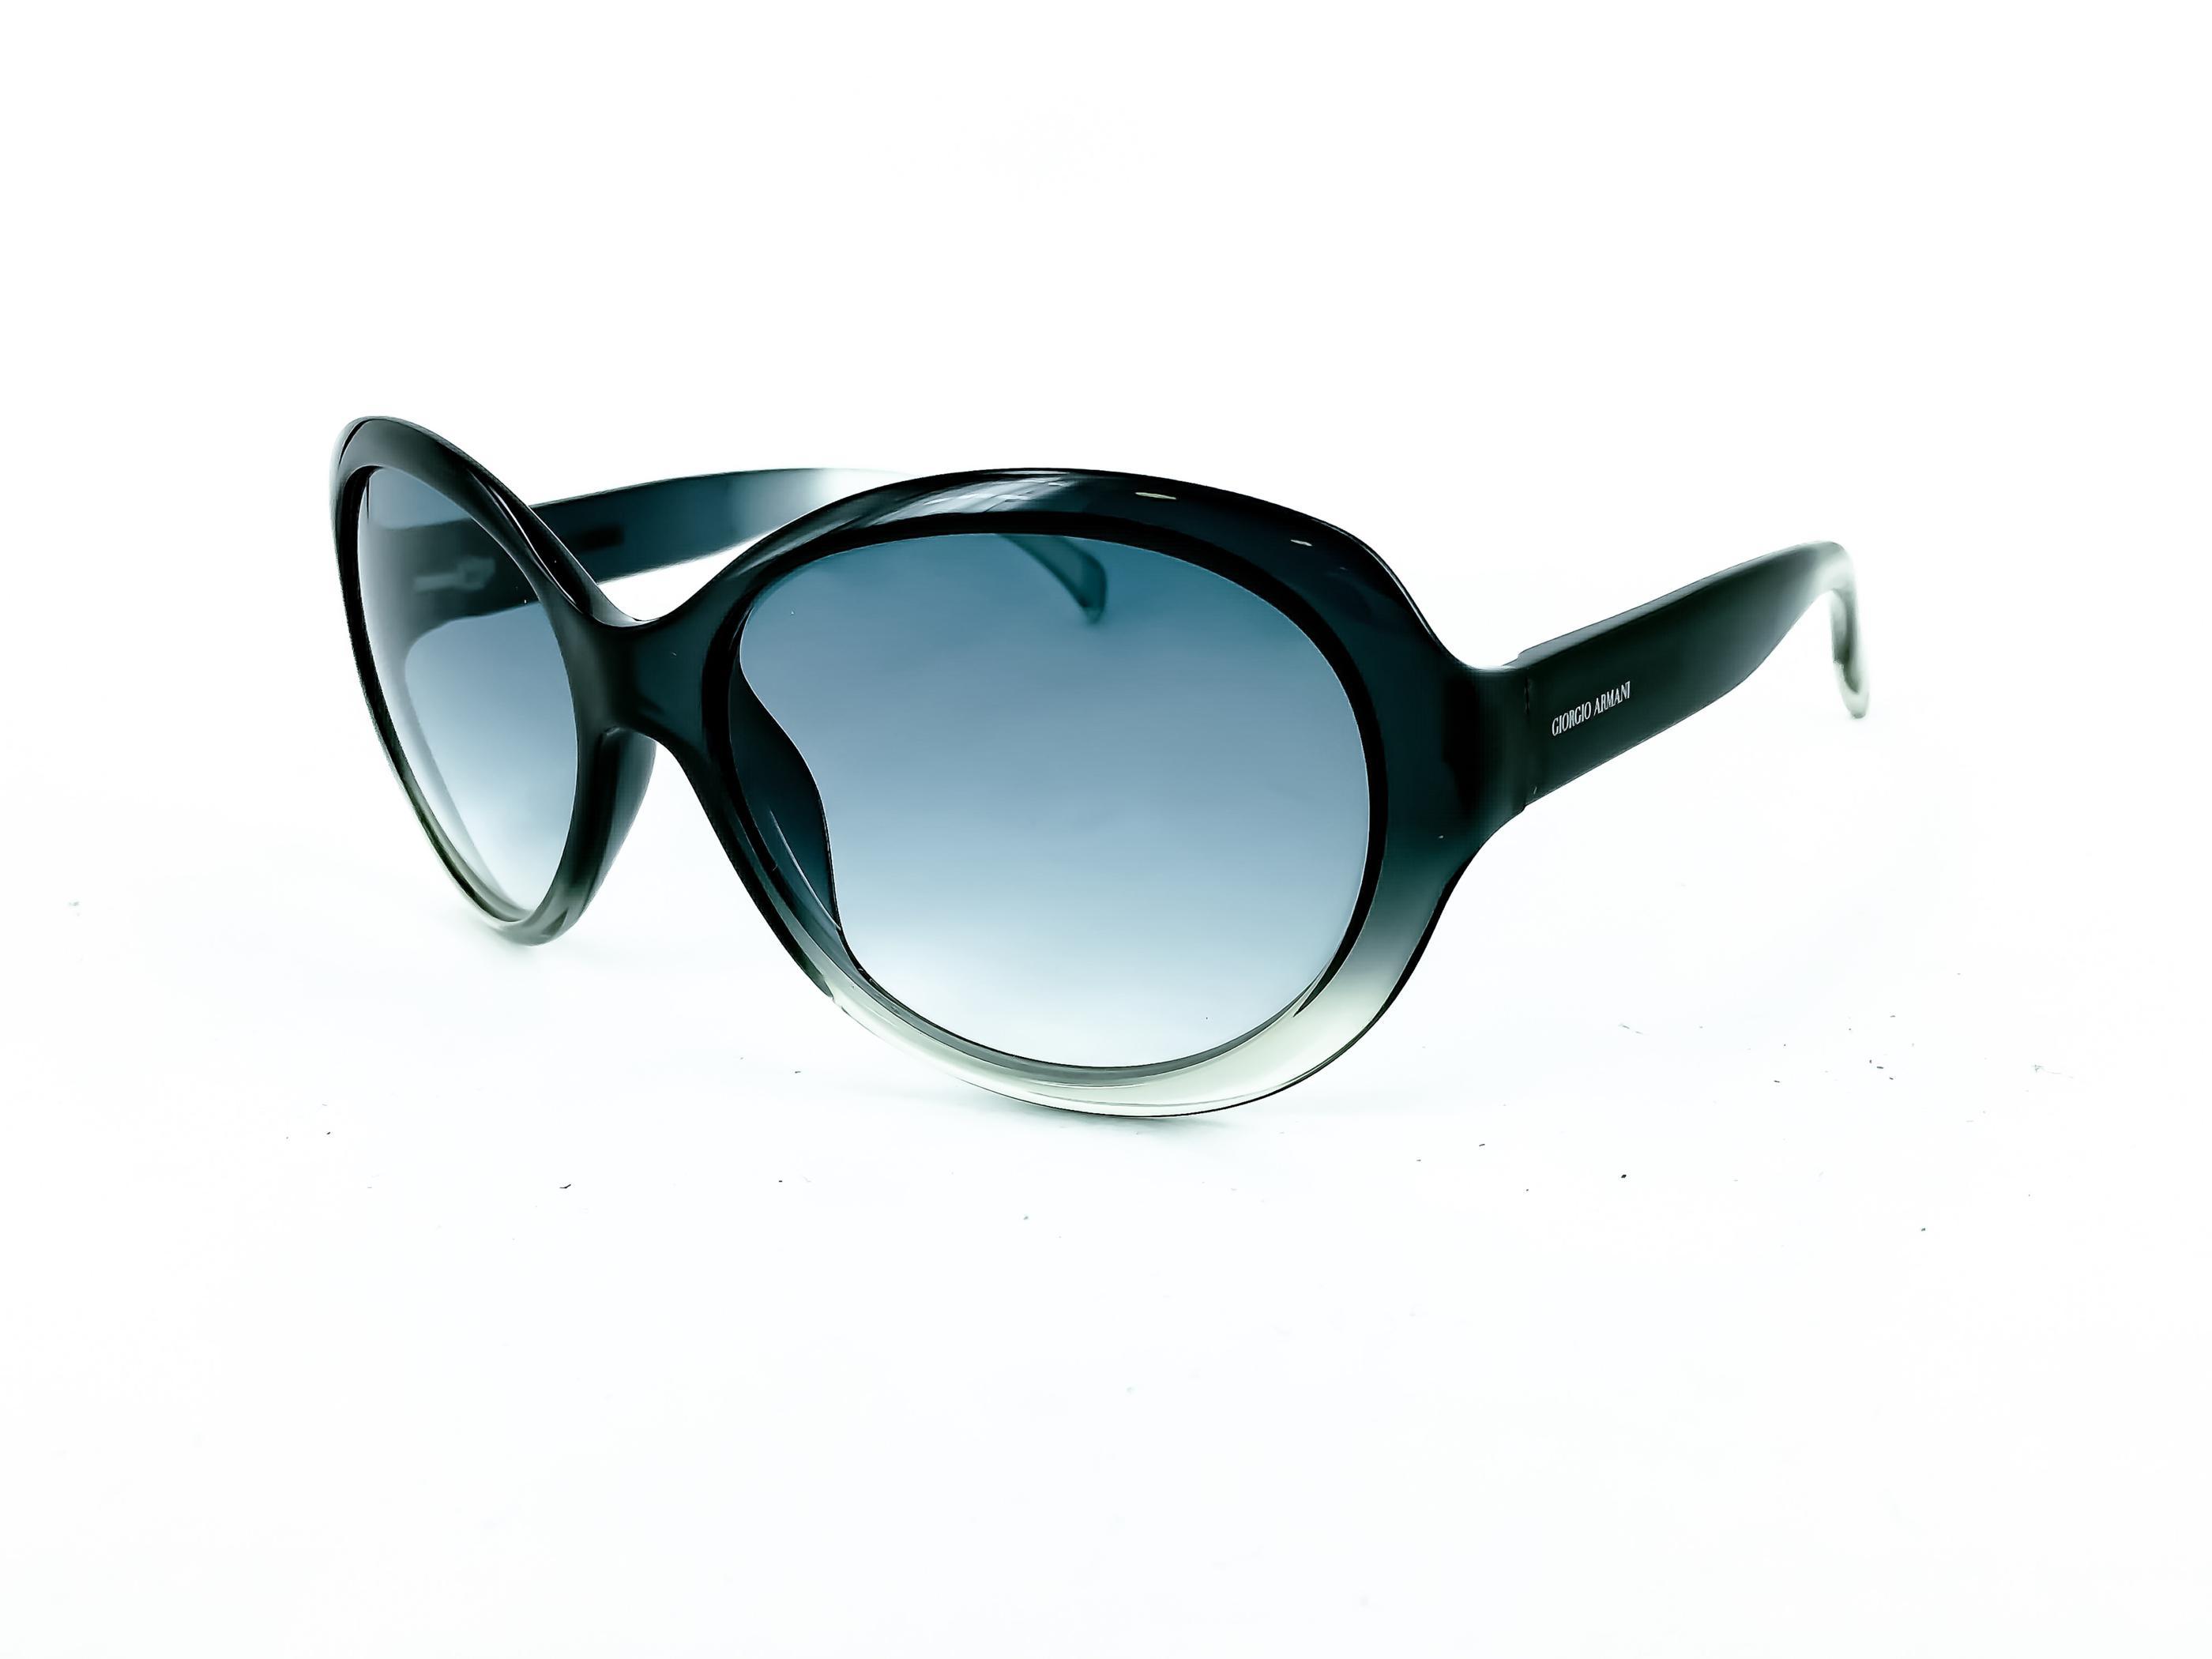 2e7b44f27b Γυναικεία γυαλιά ηλίου GIORGIO ARMANI με κωδικό GA 35 S 8K5. Τα γυαλιά ηλίου  GIORGIO ARMANI GA 35 S 8K5 έχουν κοκάλινο οβάλ σκελετό σε χρώμα  μπλε διάφανο ...